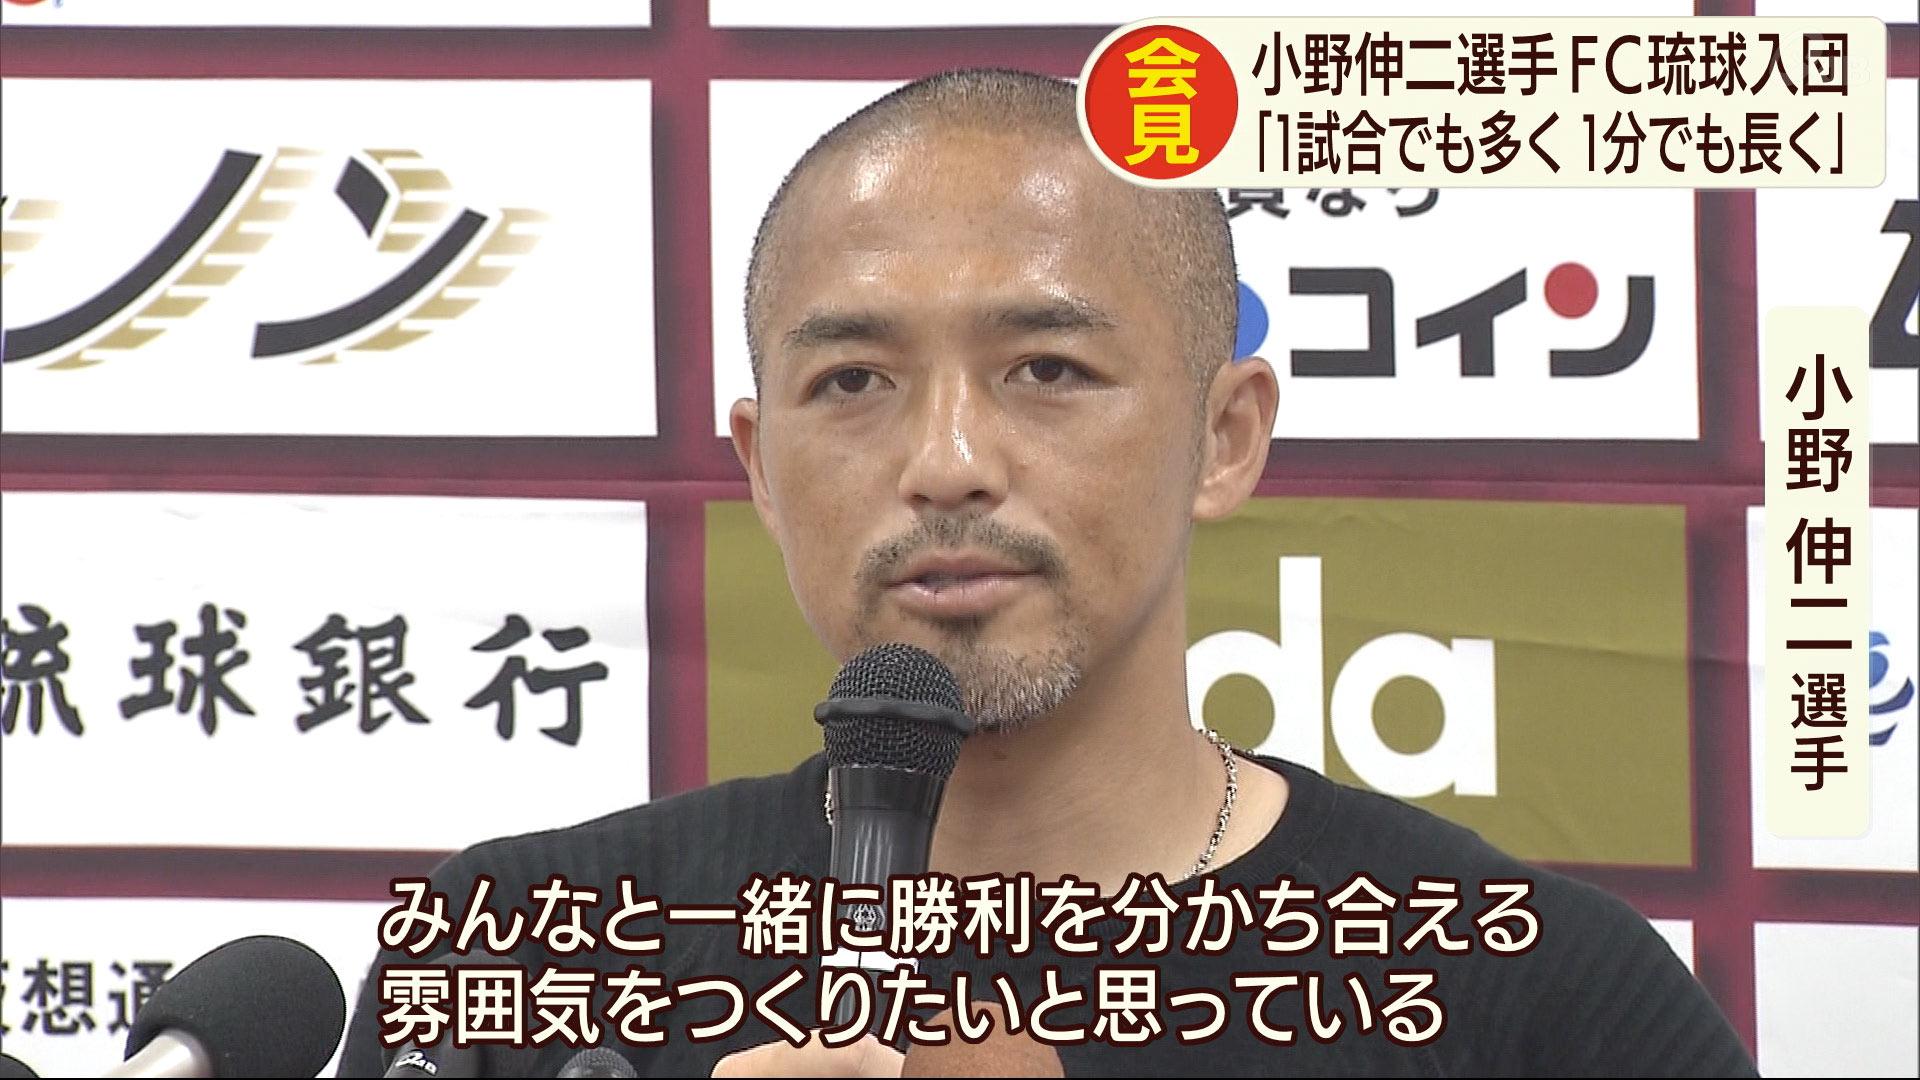 FC琉球小野伸二選手入団会見「1分でも長く」